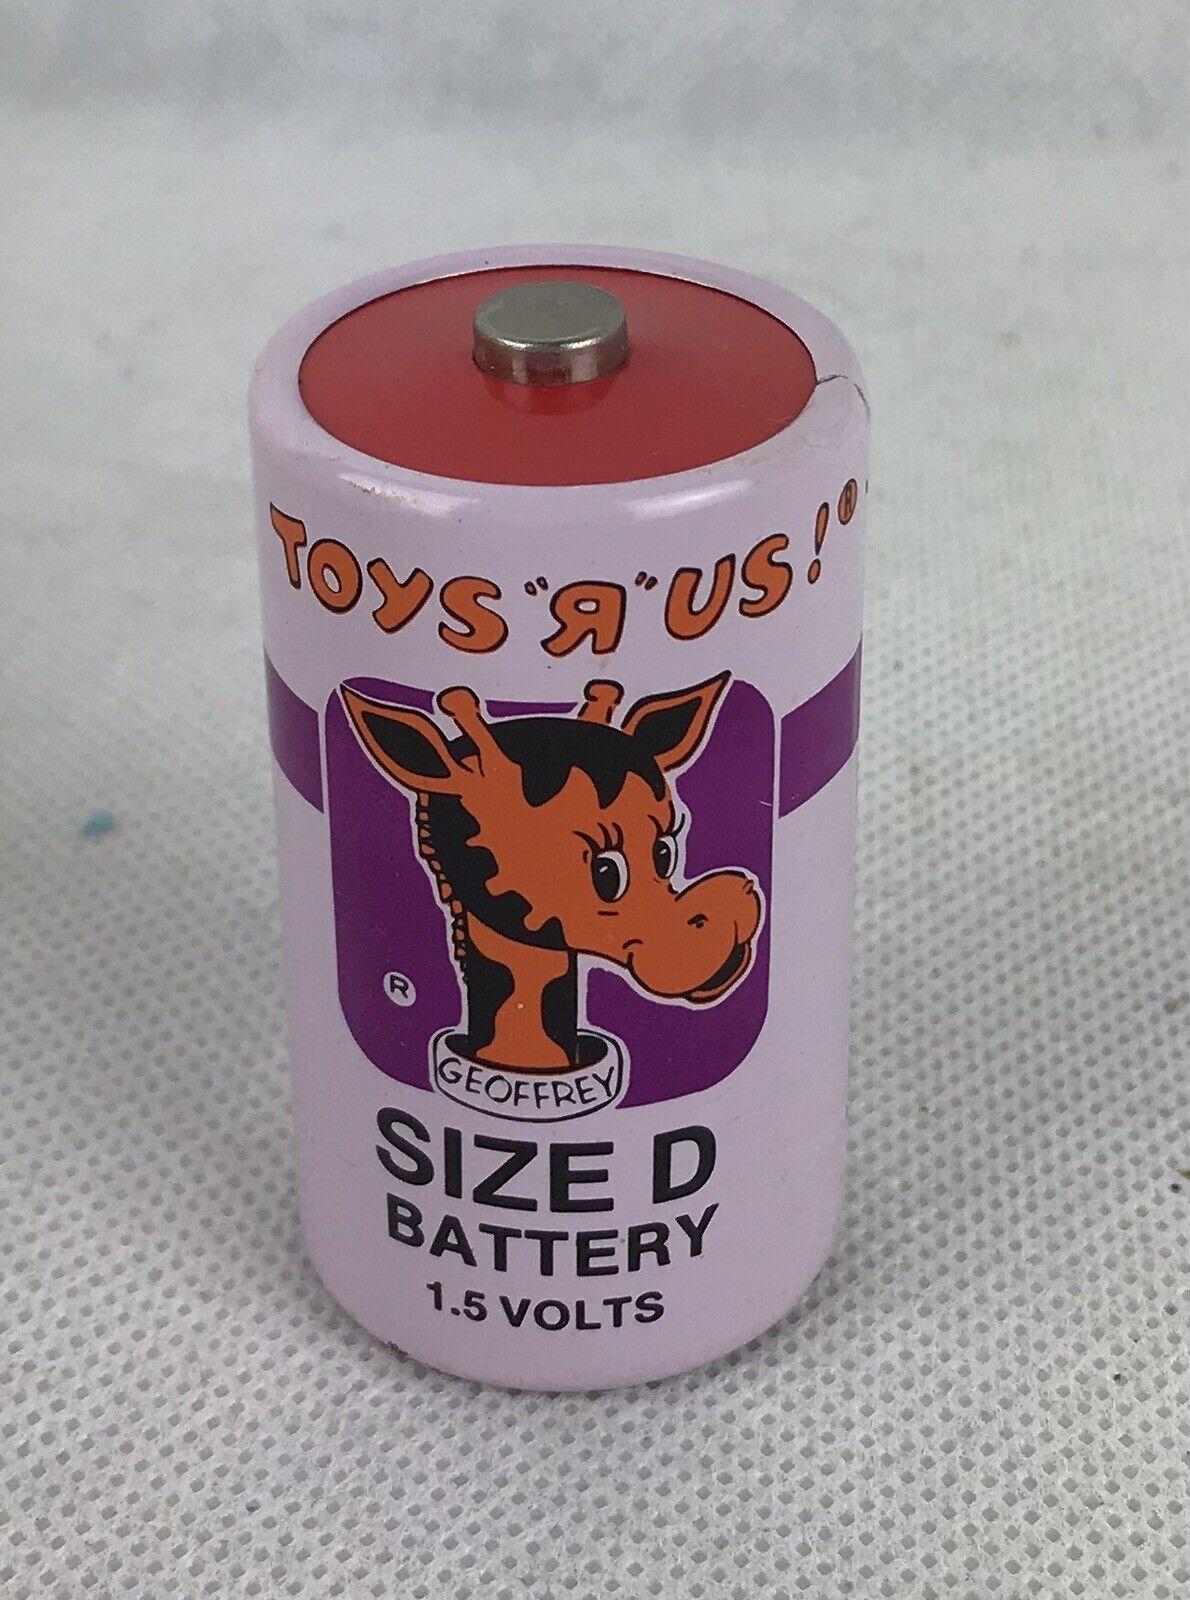 De Colección Toys R Us batería de tamaño D con Geoffrey Jirafa, 70' -80' Usada